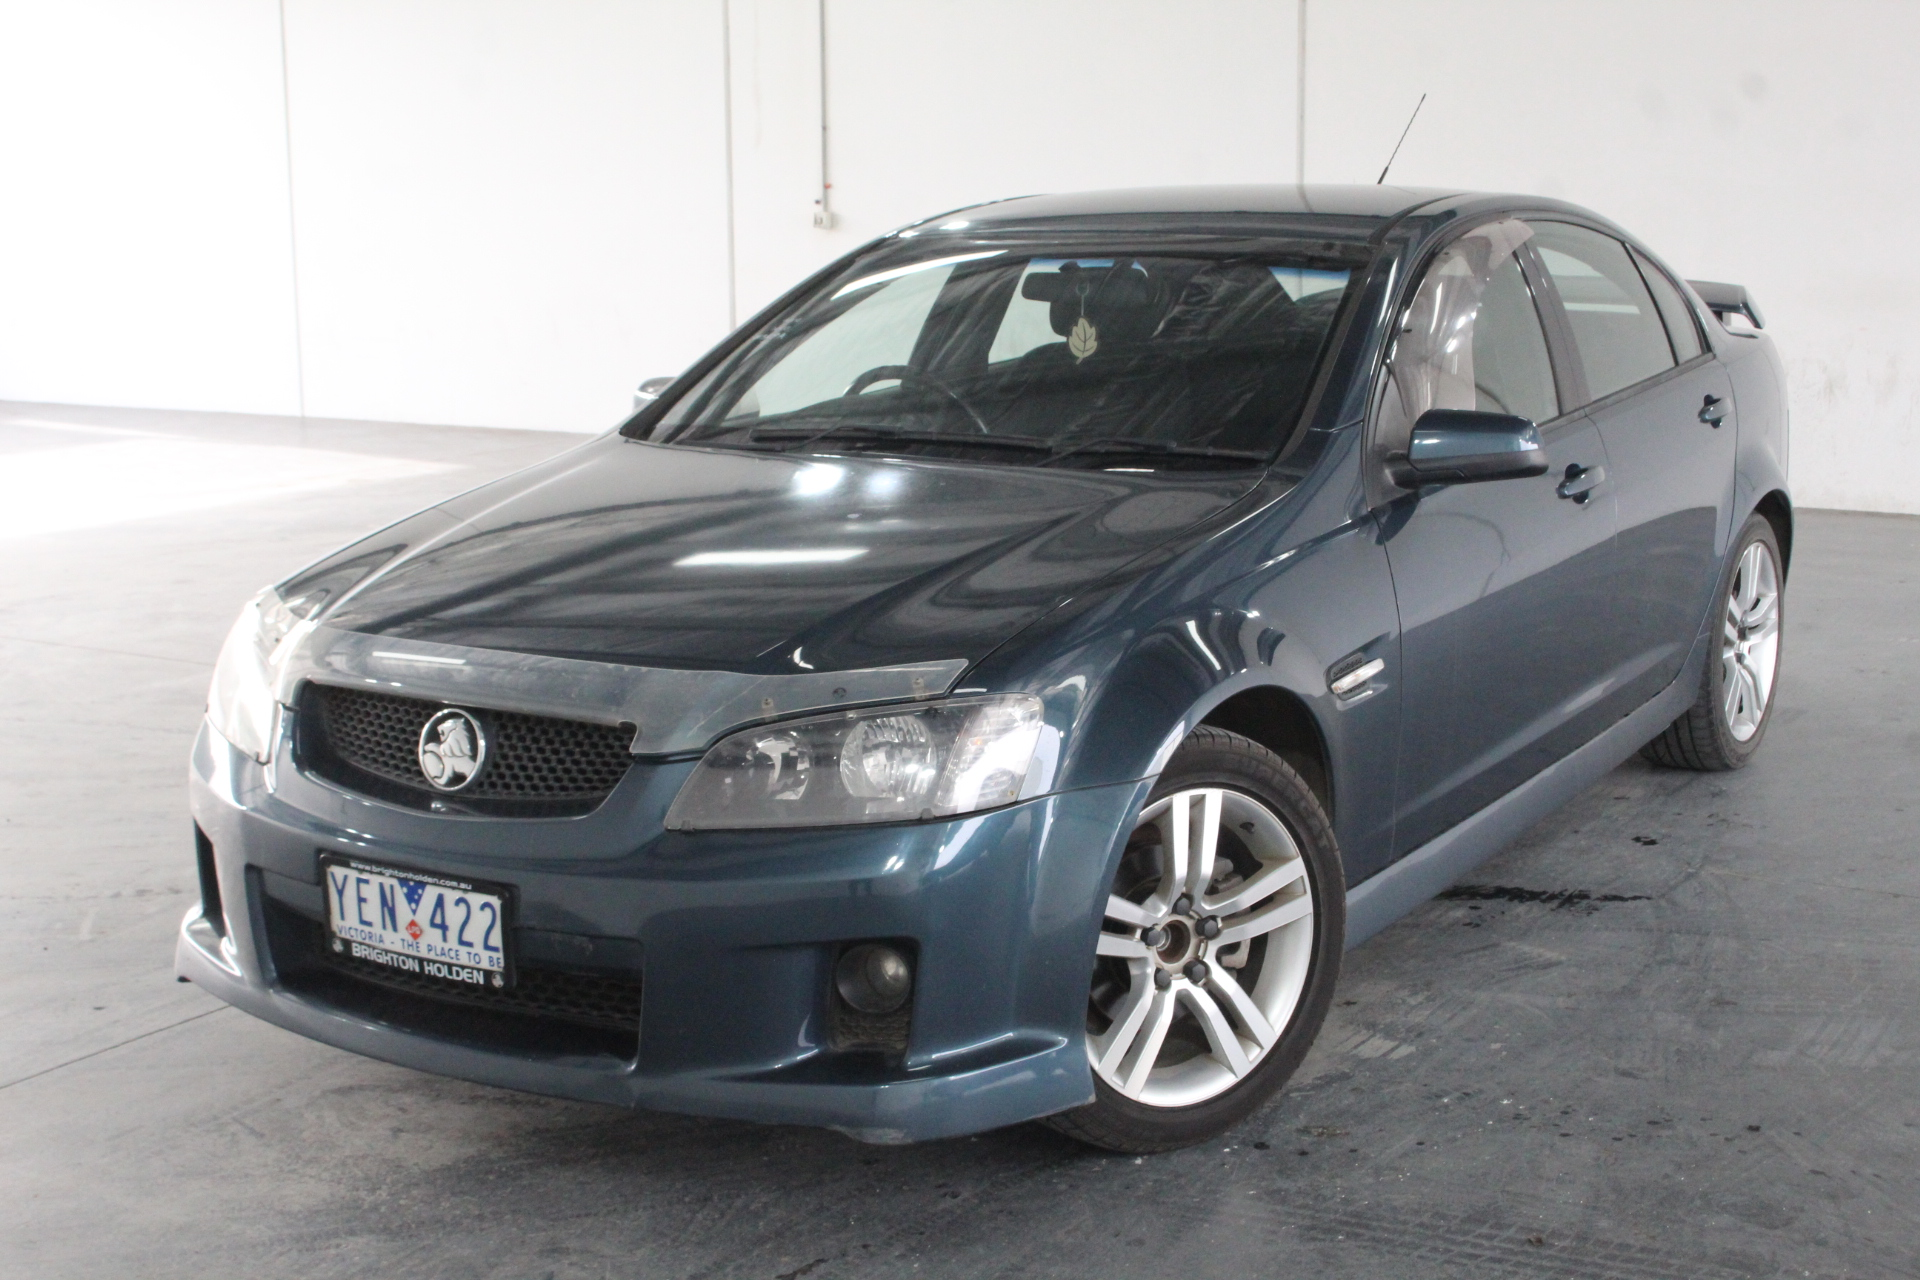 2009 Holden Commodore SV6 VE Automatic Sedan